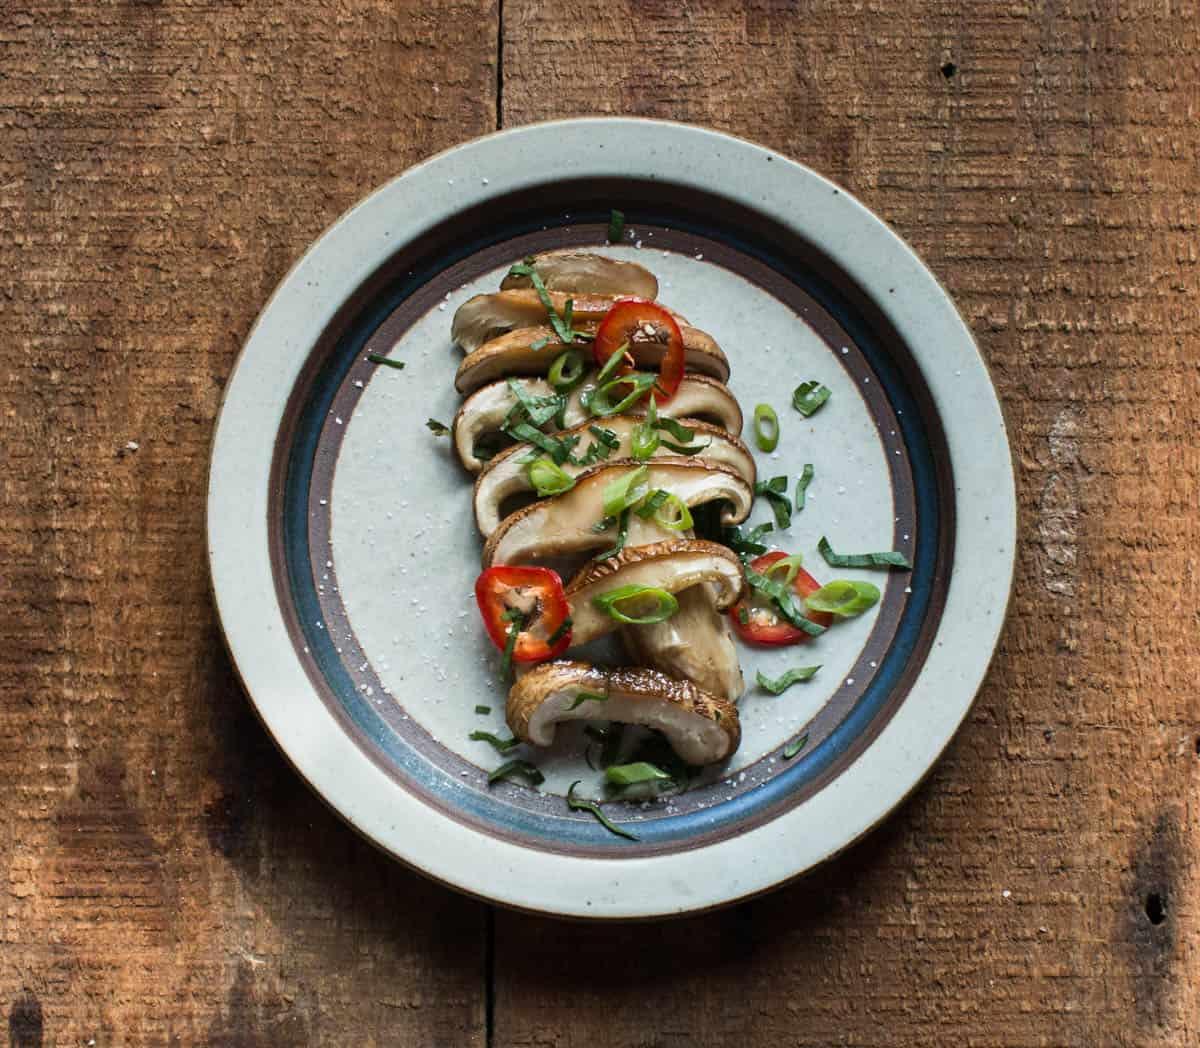 Minnesota matsutake mushrooms baked in parchment